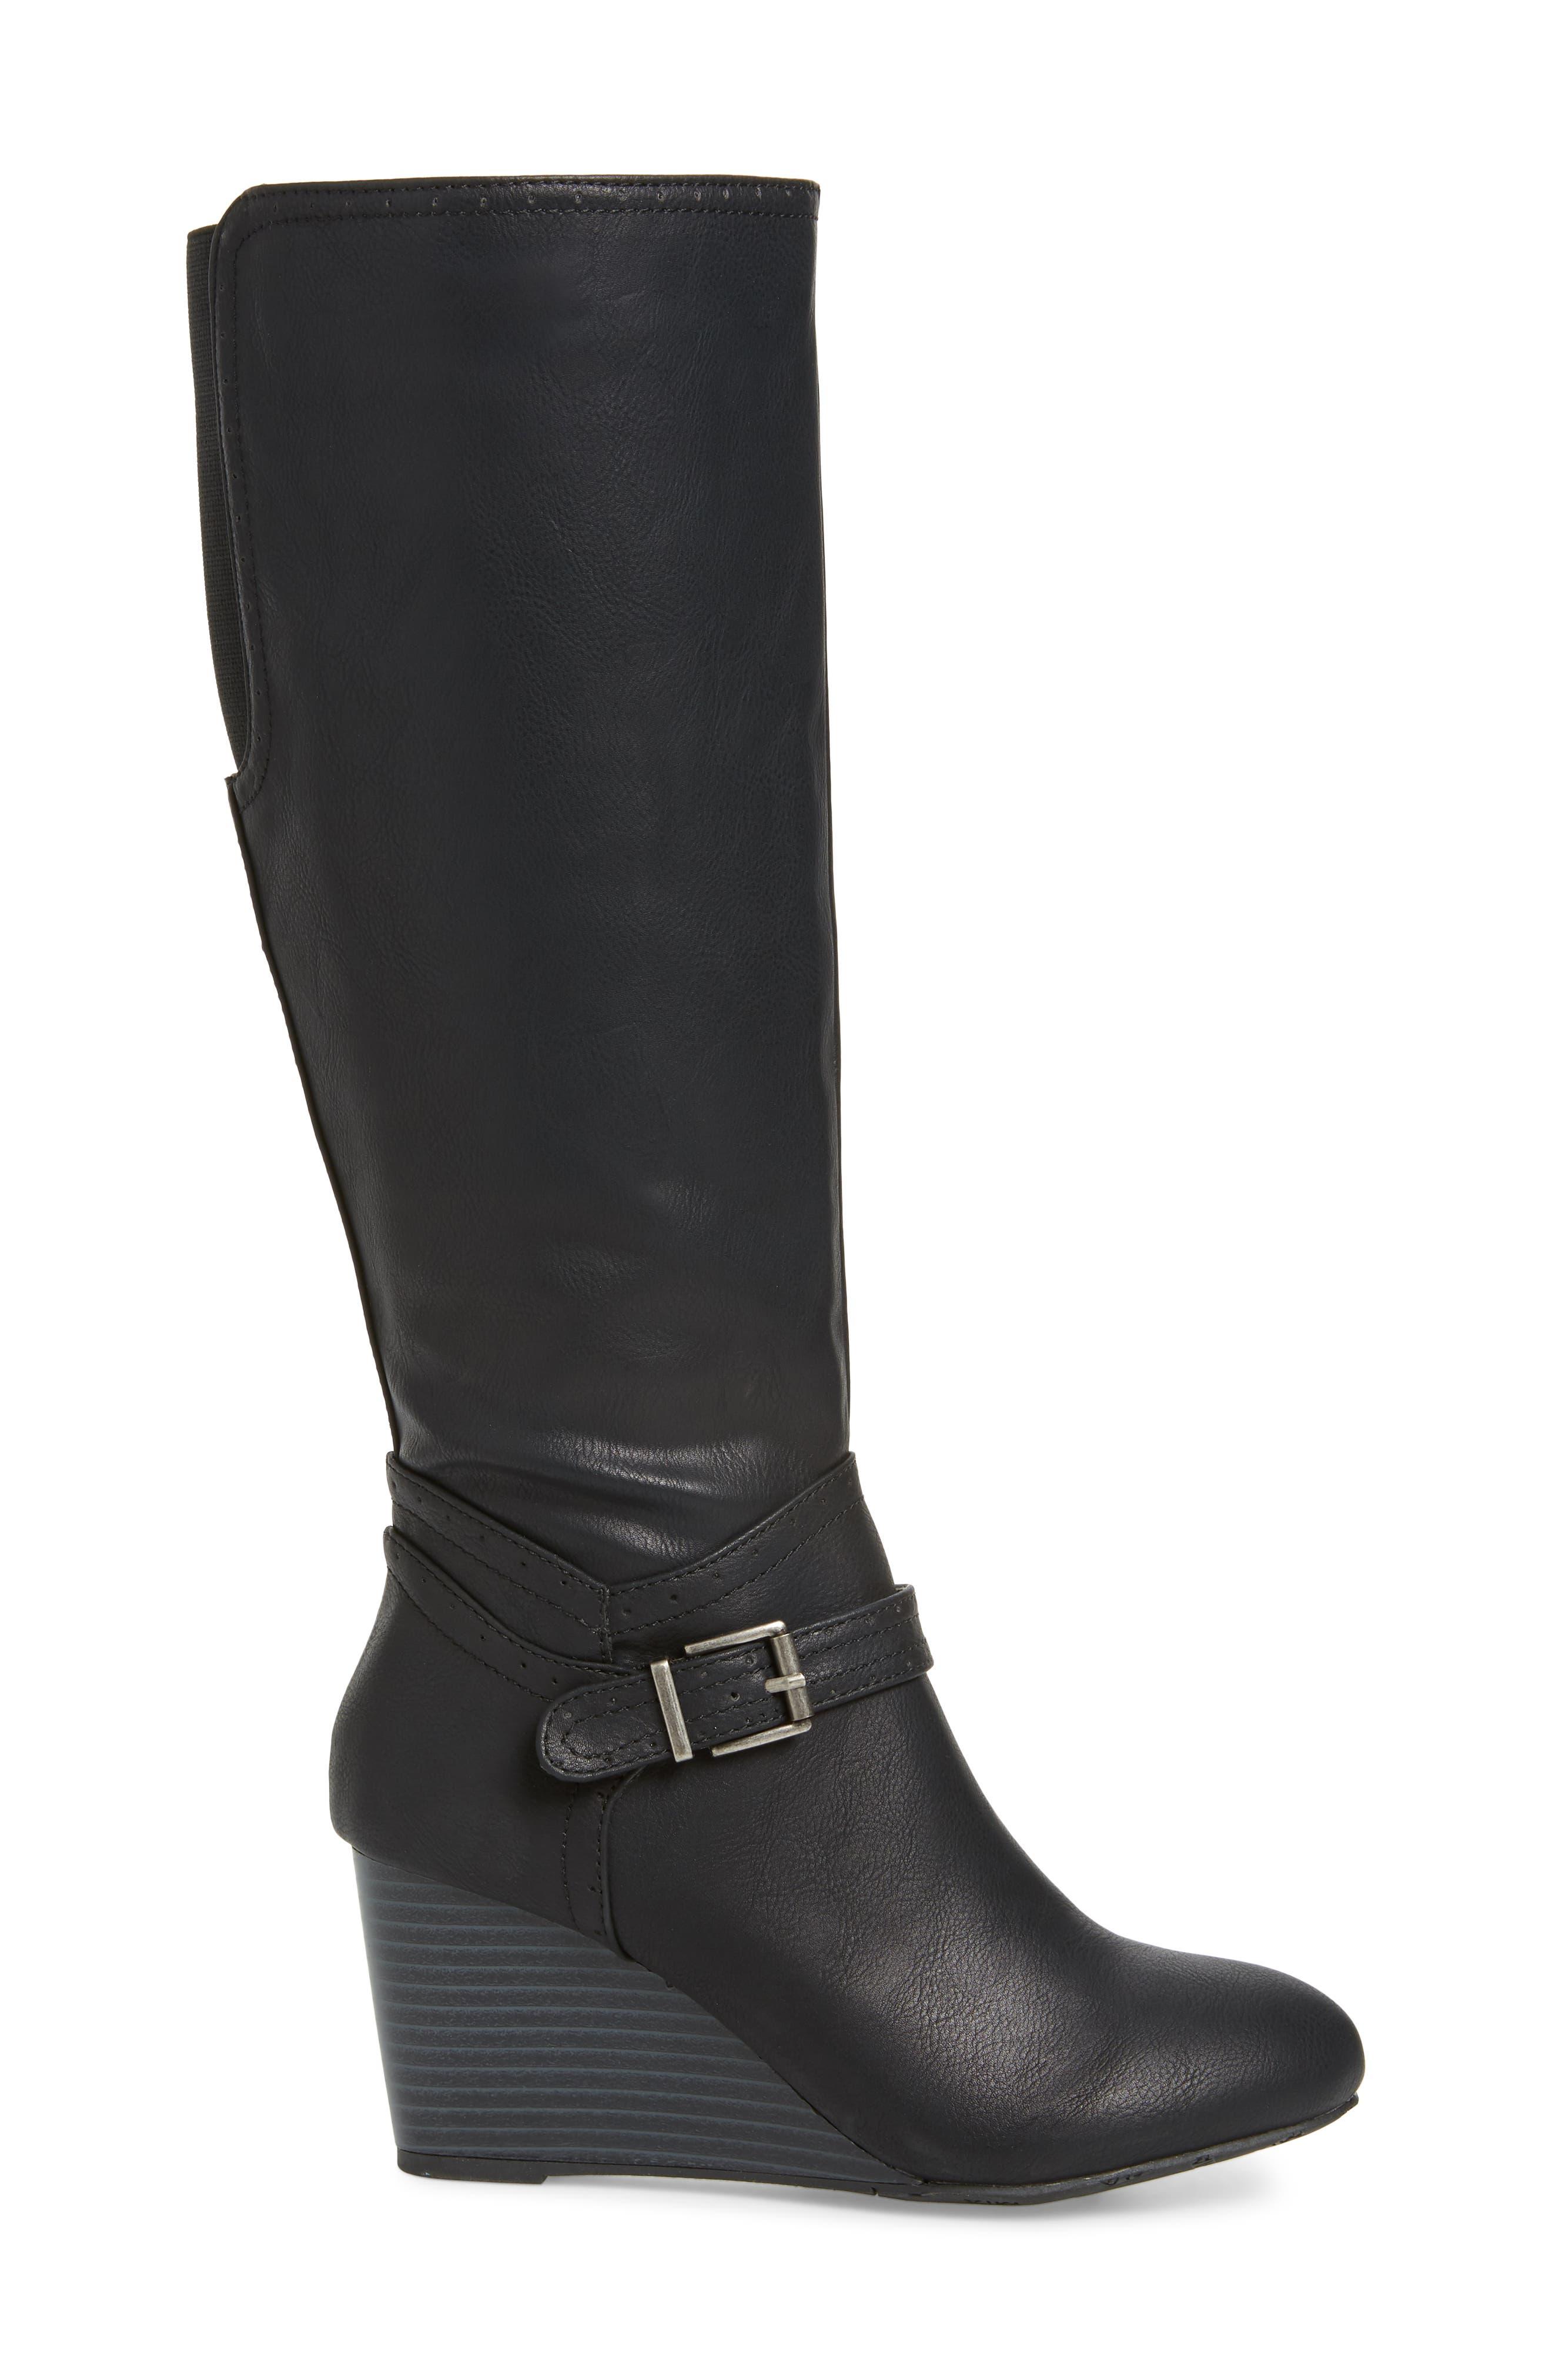 Claretta Knee High Wedge Boot,                             Alternate thumbnail 3, color,                             BLACK VEGAN LEATHER